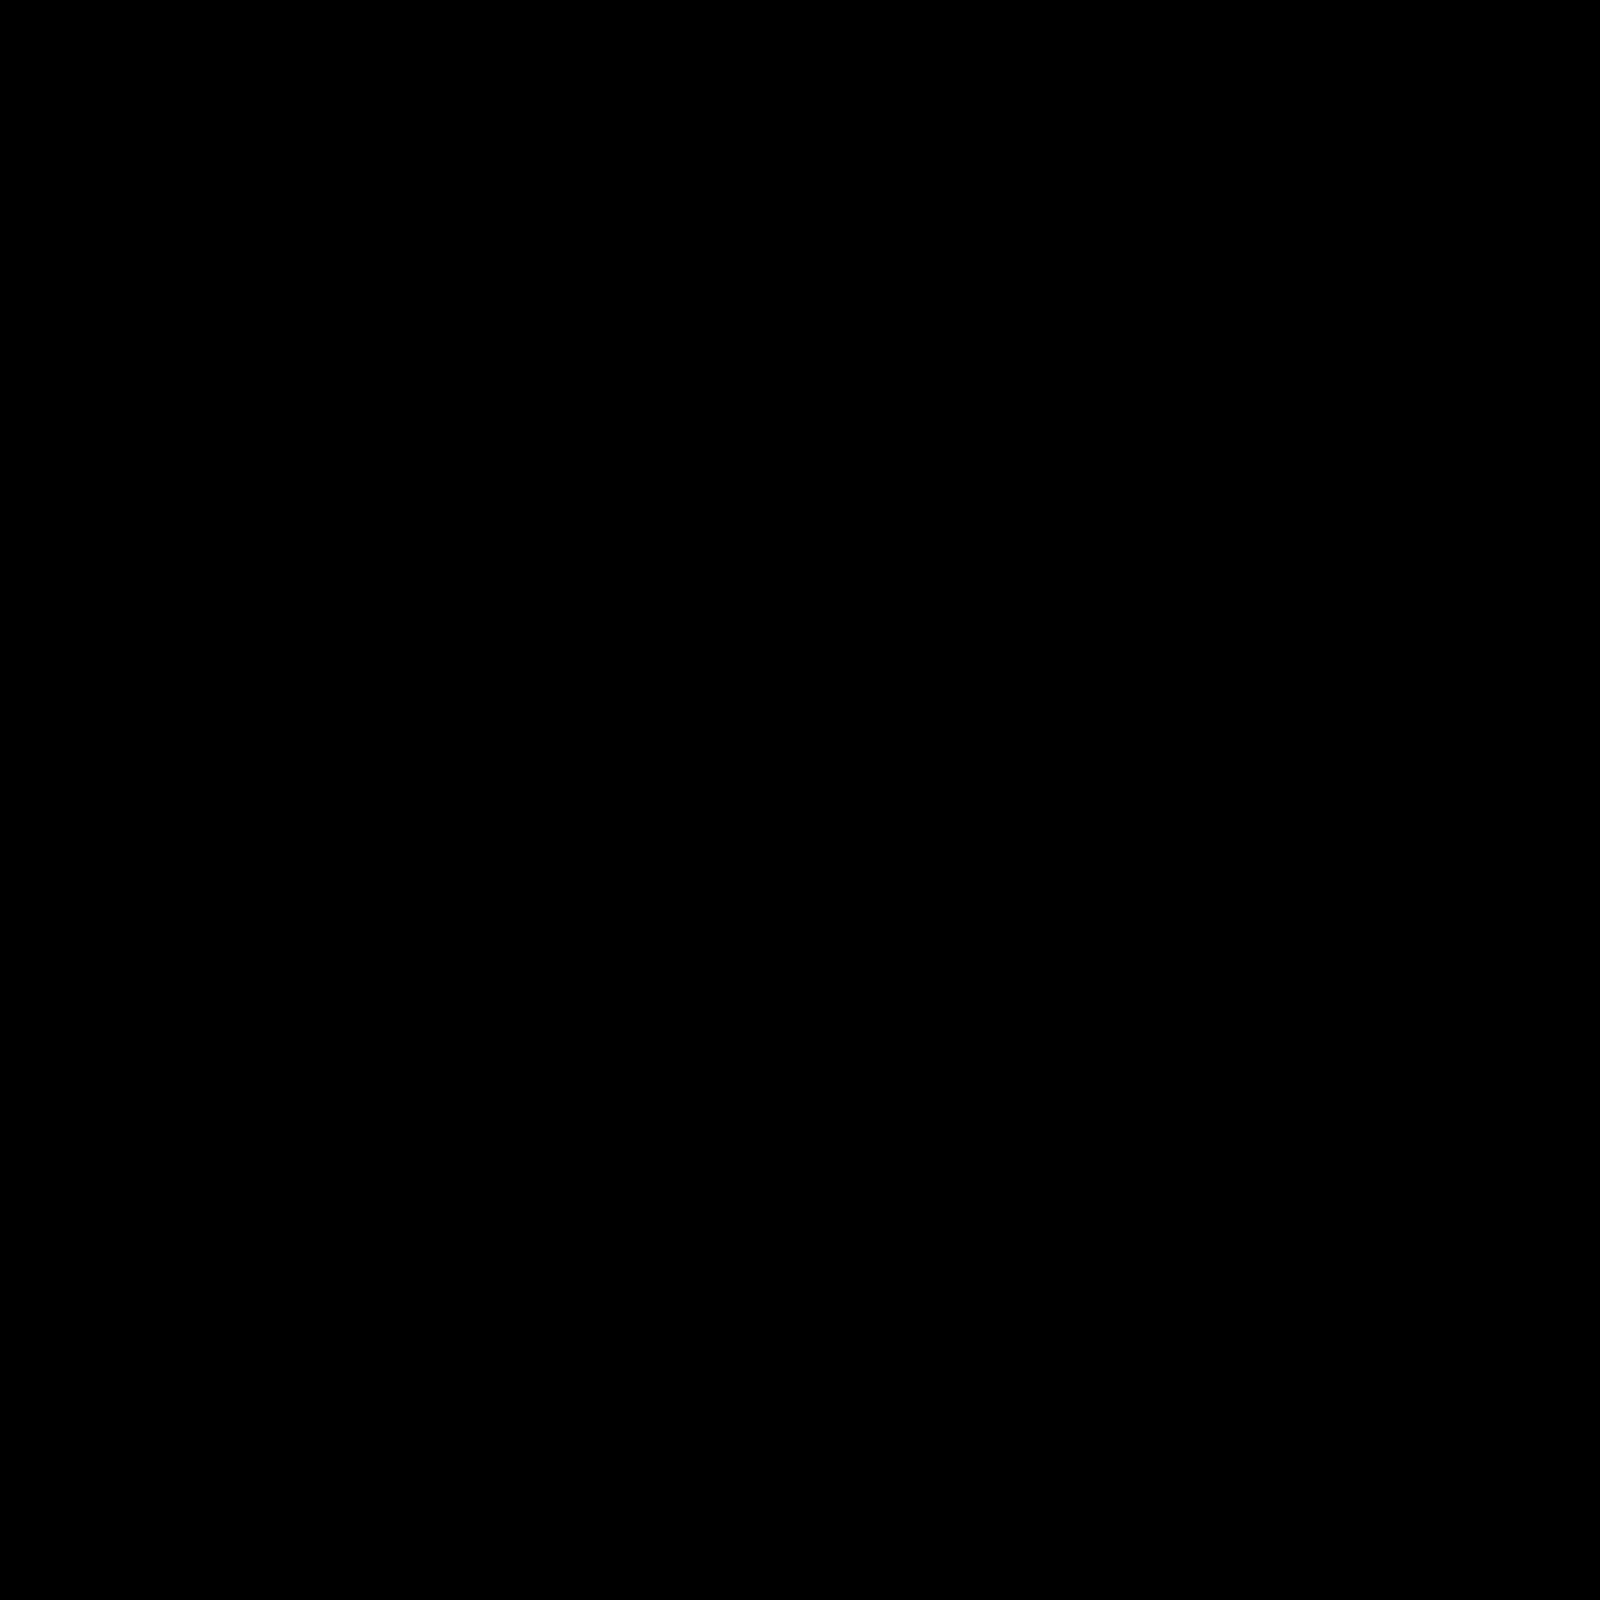 Squared Menu Filled icon